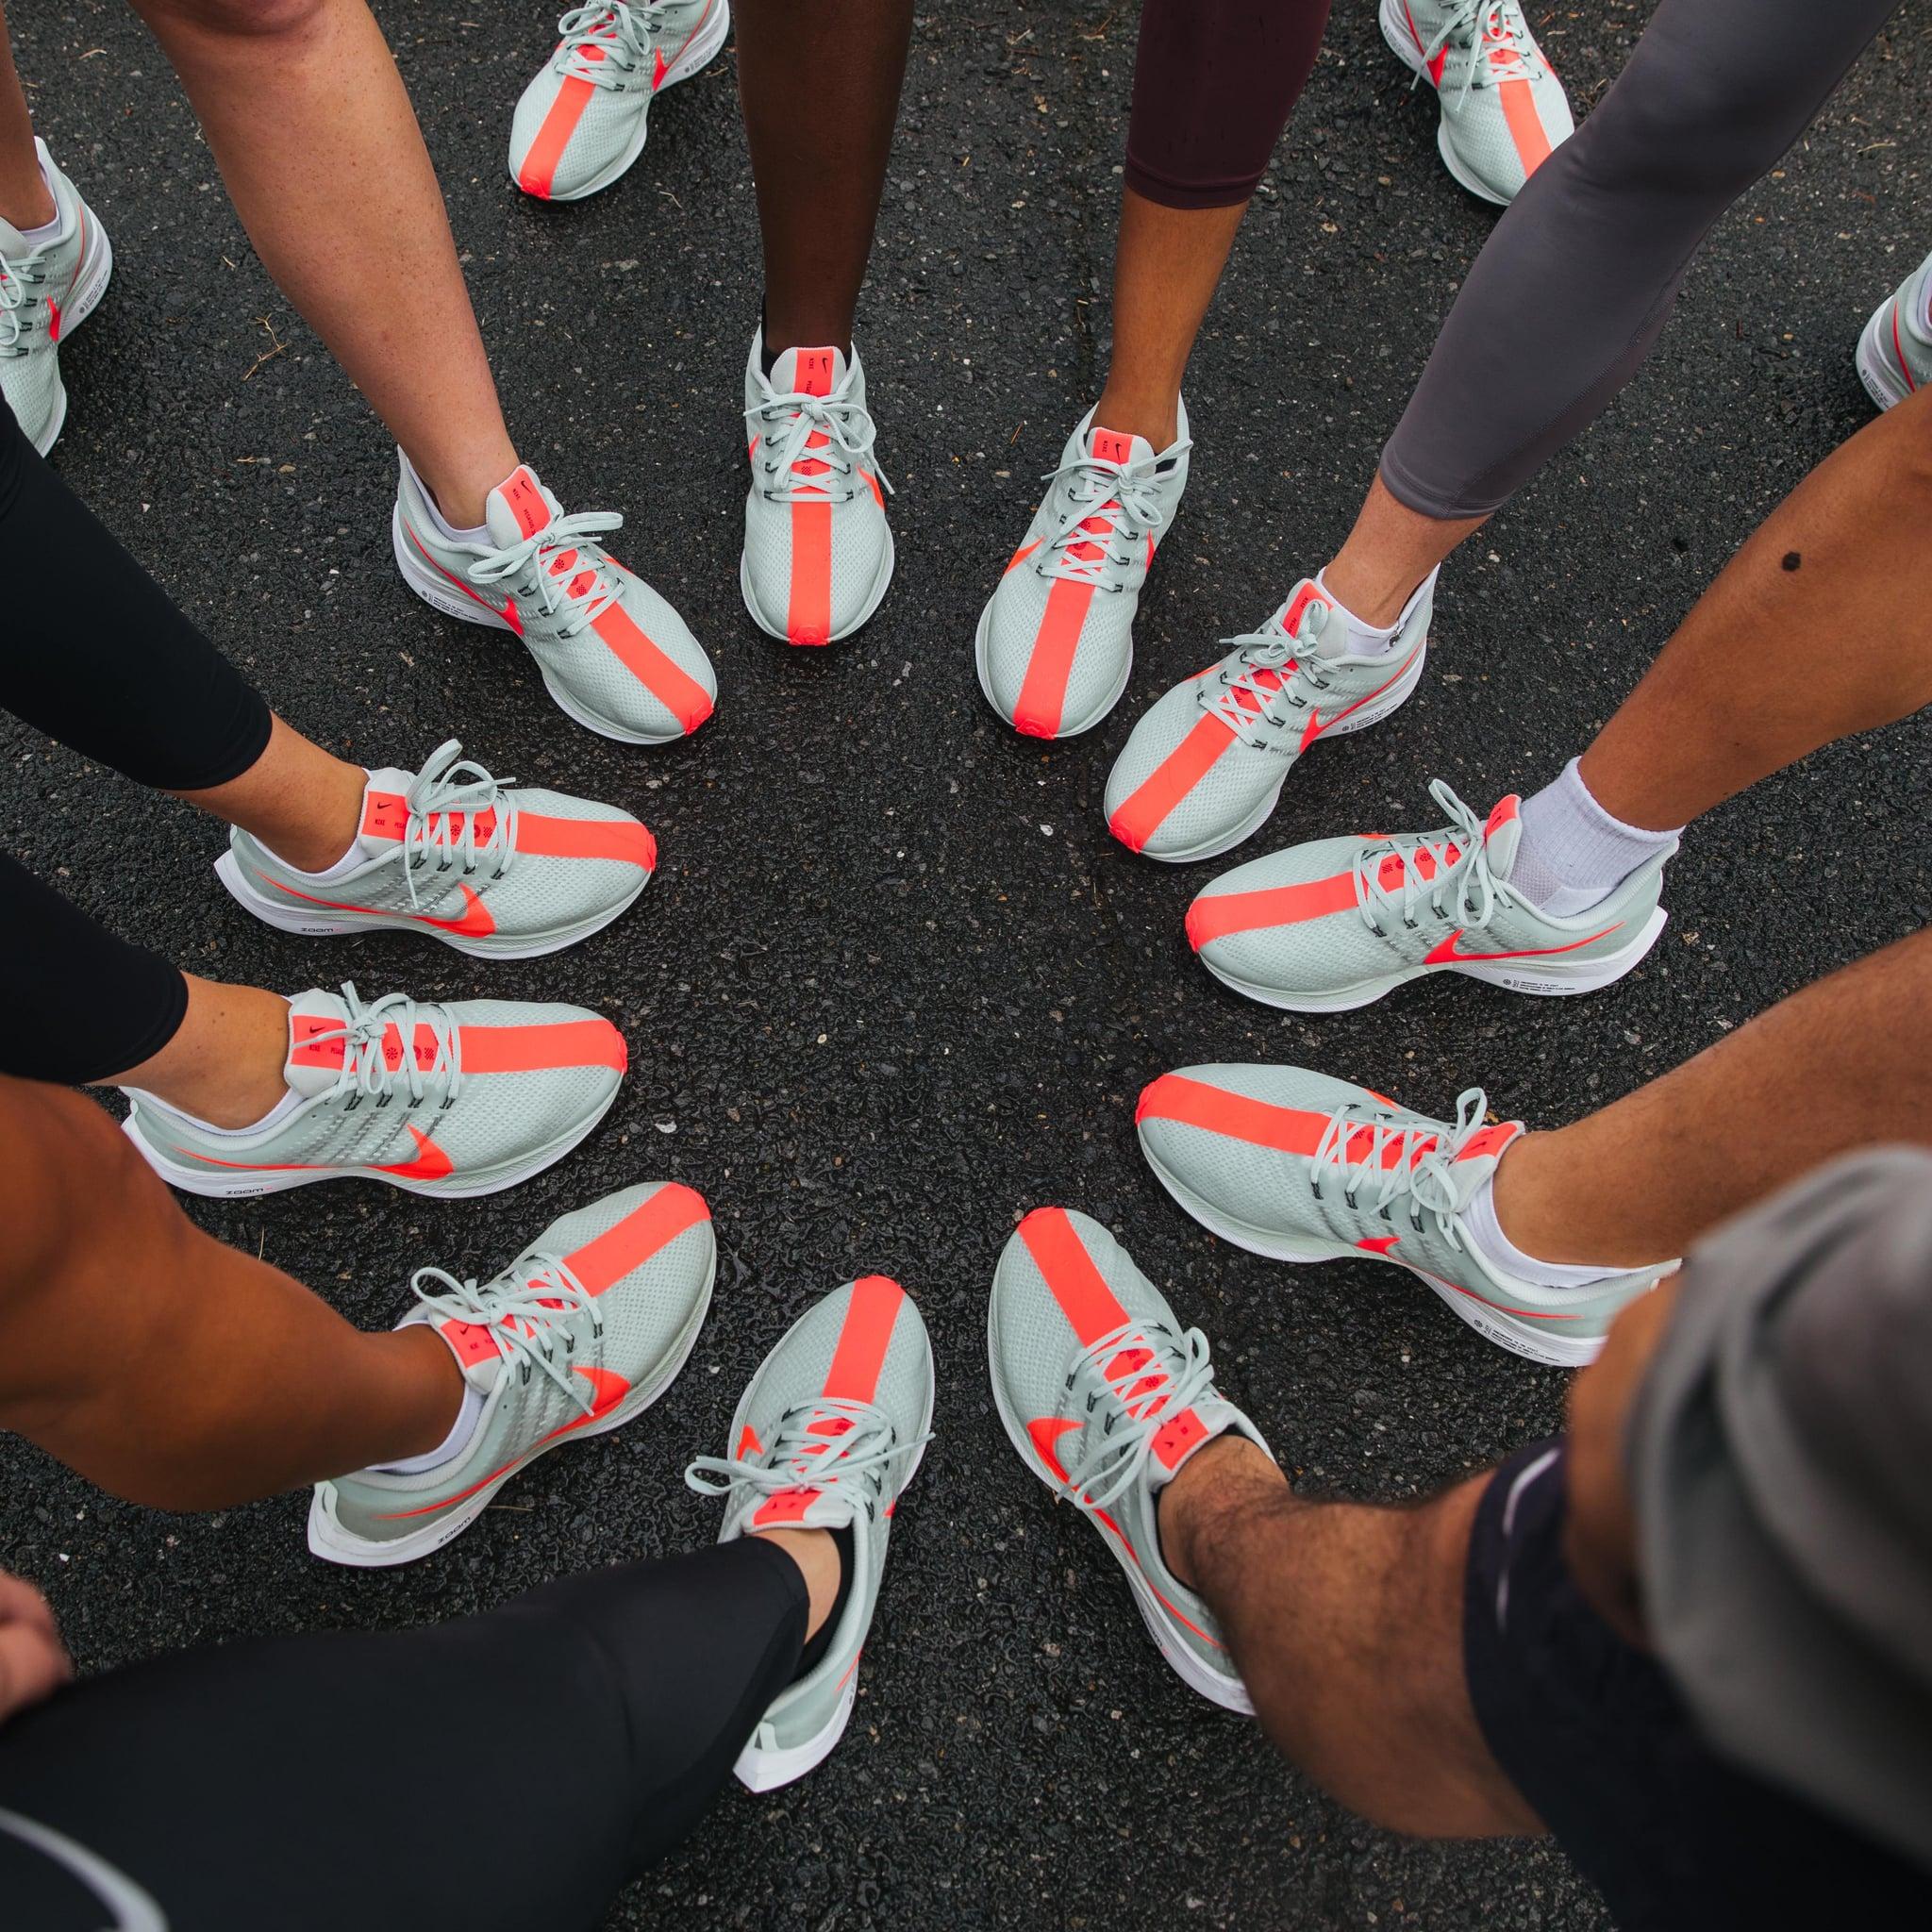 03d585e5f9b8 Nike Zoom Pegasus Turbo Running Shoe Review